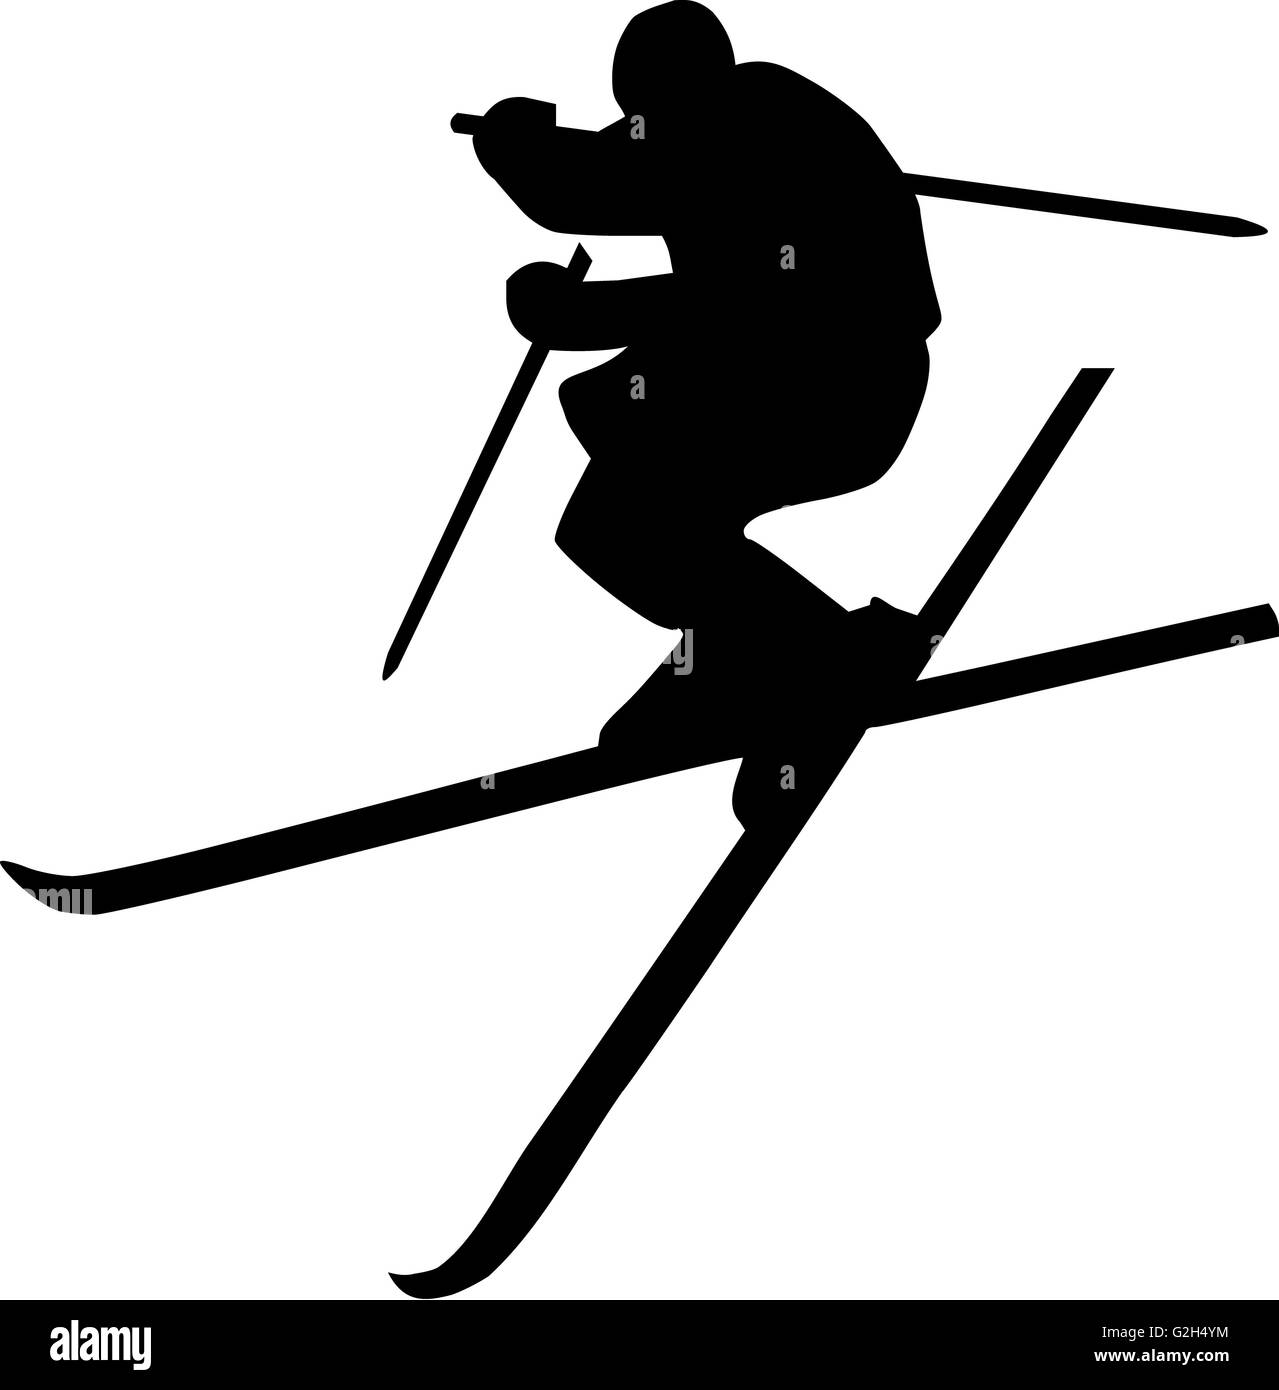 Ski Jumping Silhouette - Stock Image